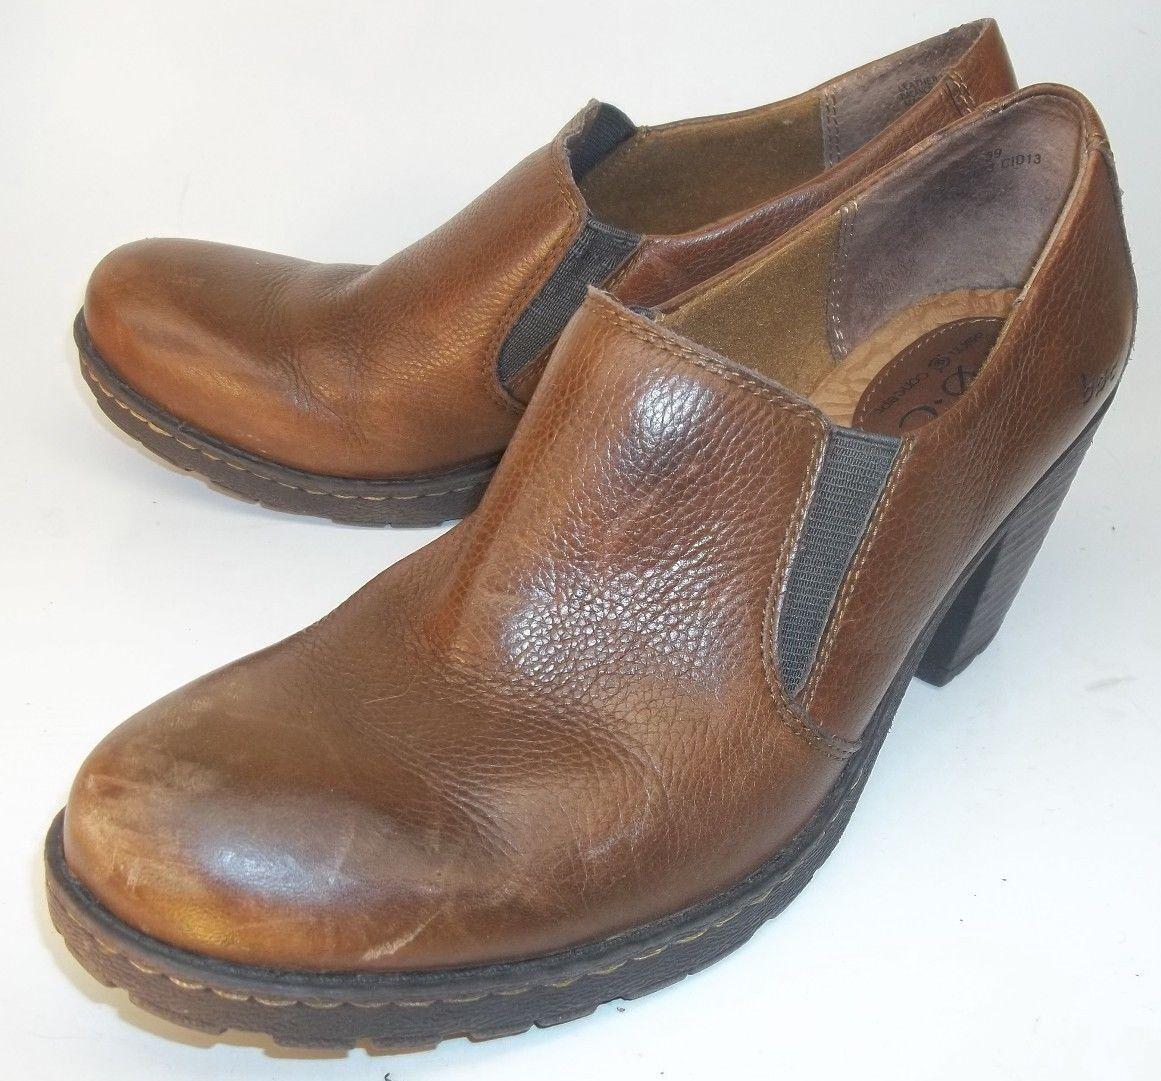 B.O.C Born Concept Wos Loafer Heels US 8 M EU 39 marron Leather 781